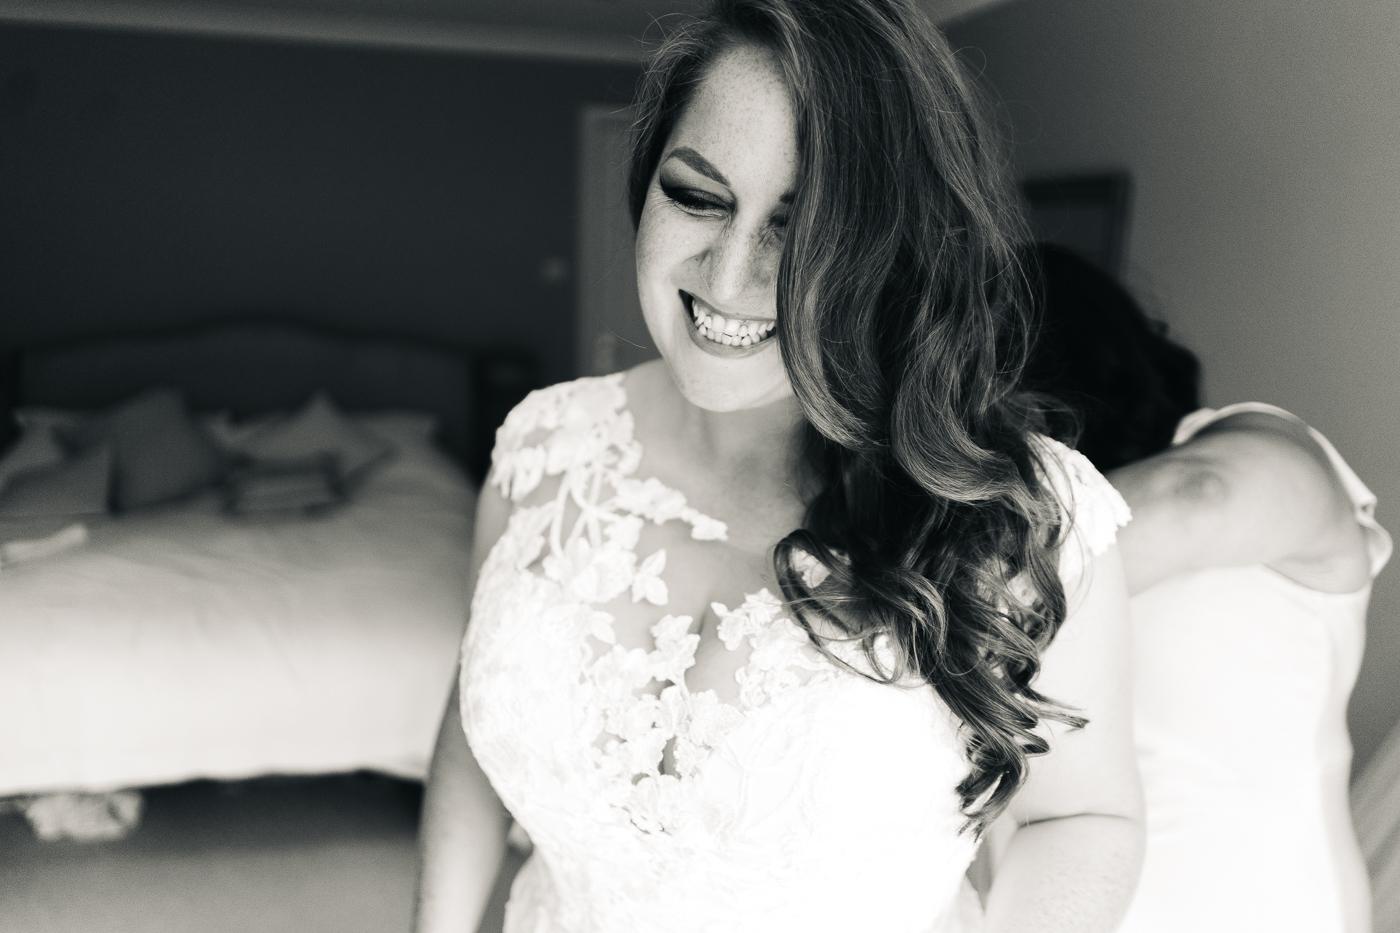 wedding-at-the-pheasant-harome-helmsley-north-yorkshire-wedding-photographer-0004.jpg